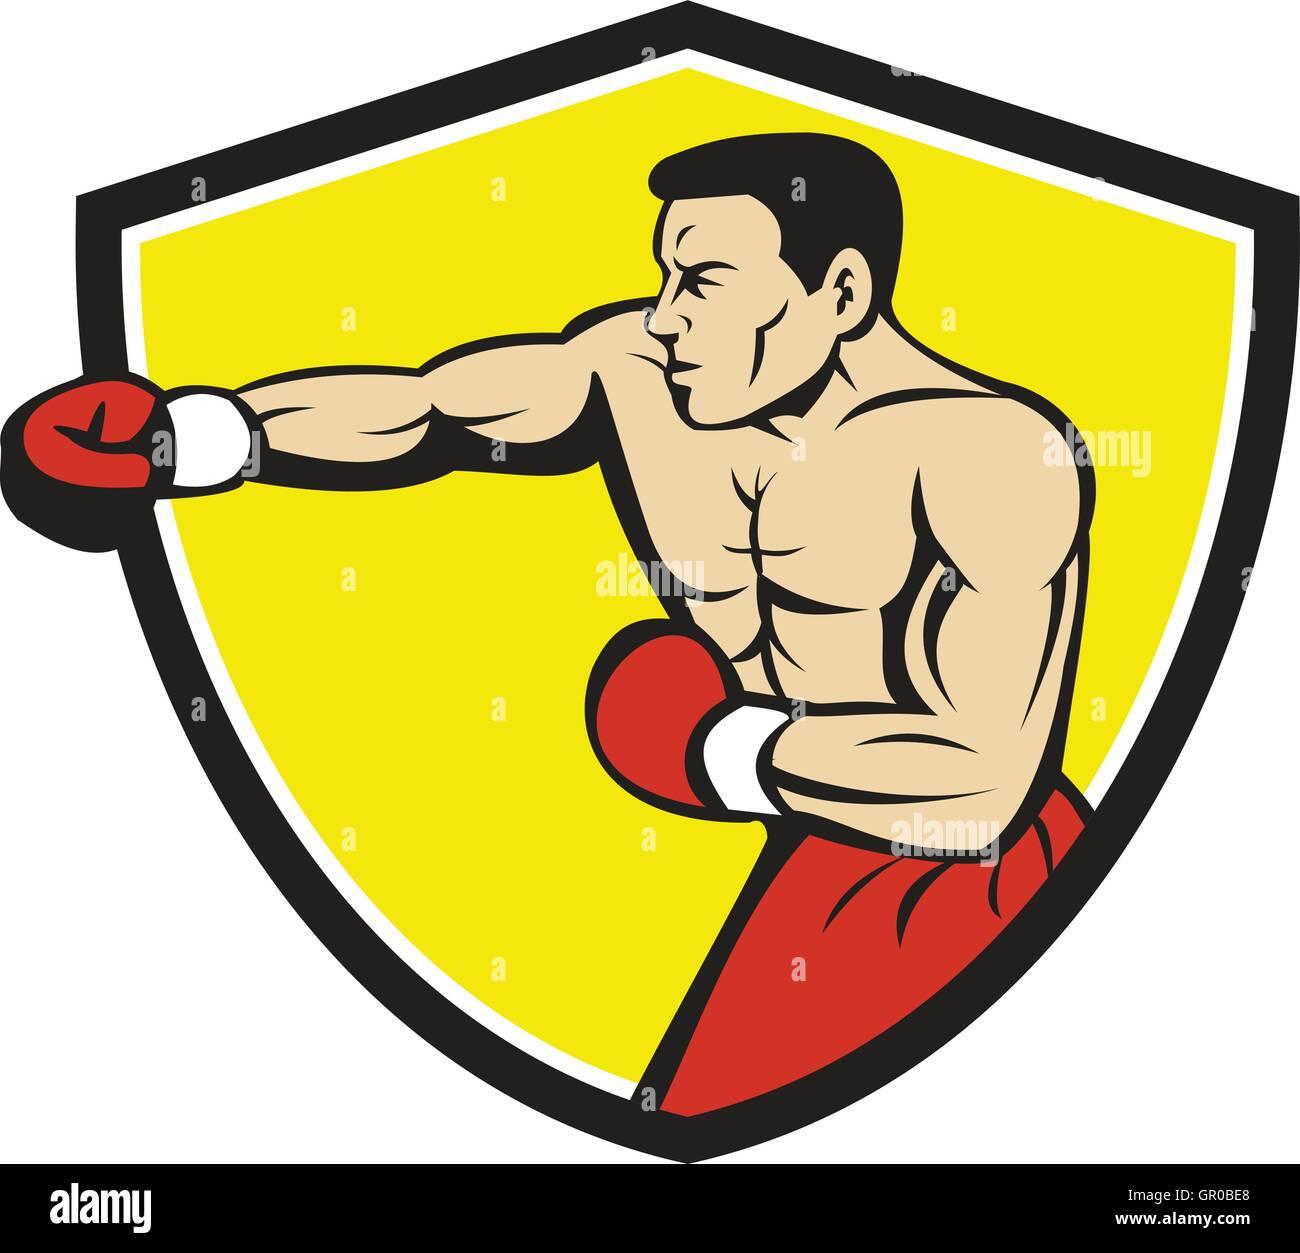 Illustration Of A Boxer Wearing Boxing Gloves Jabbing Punching